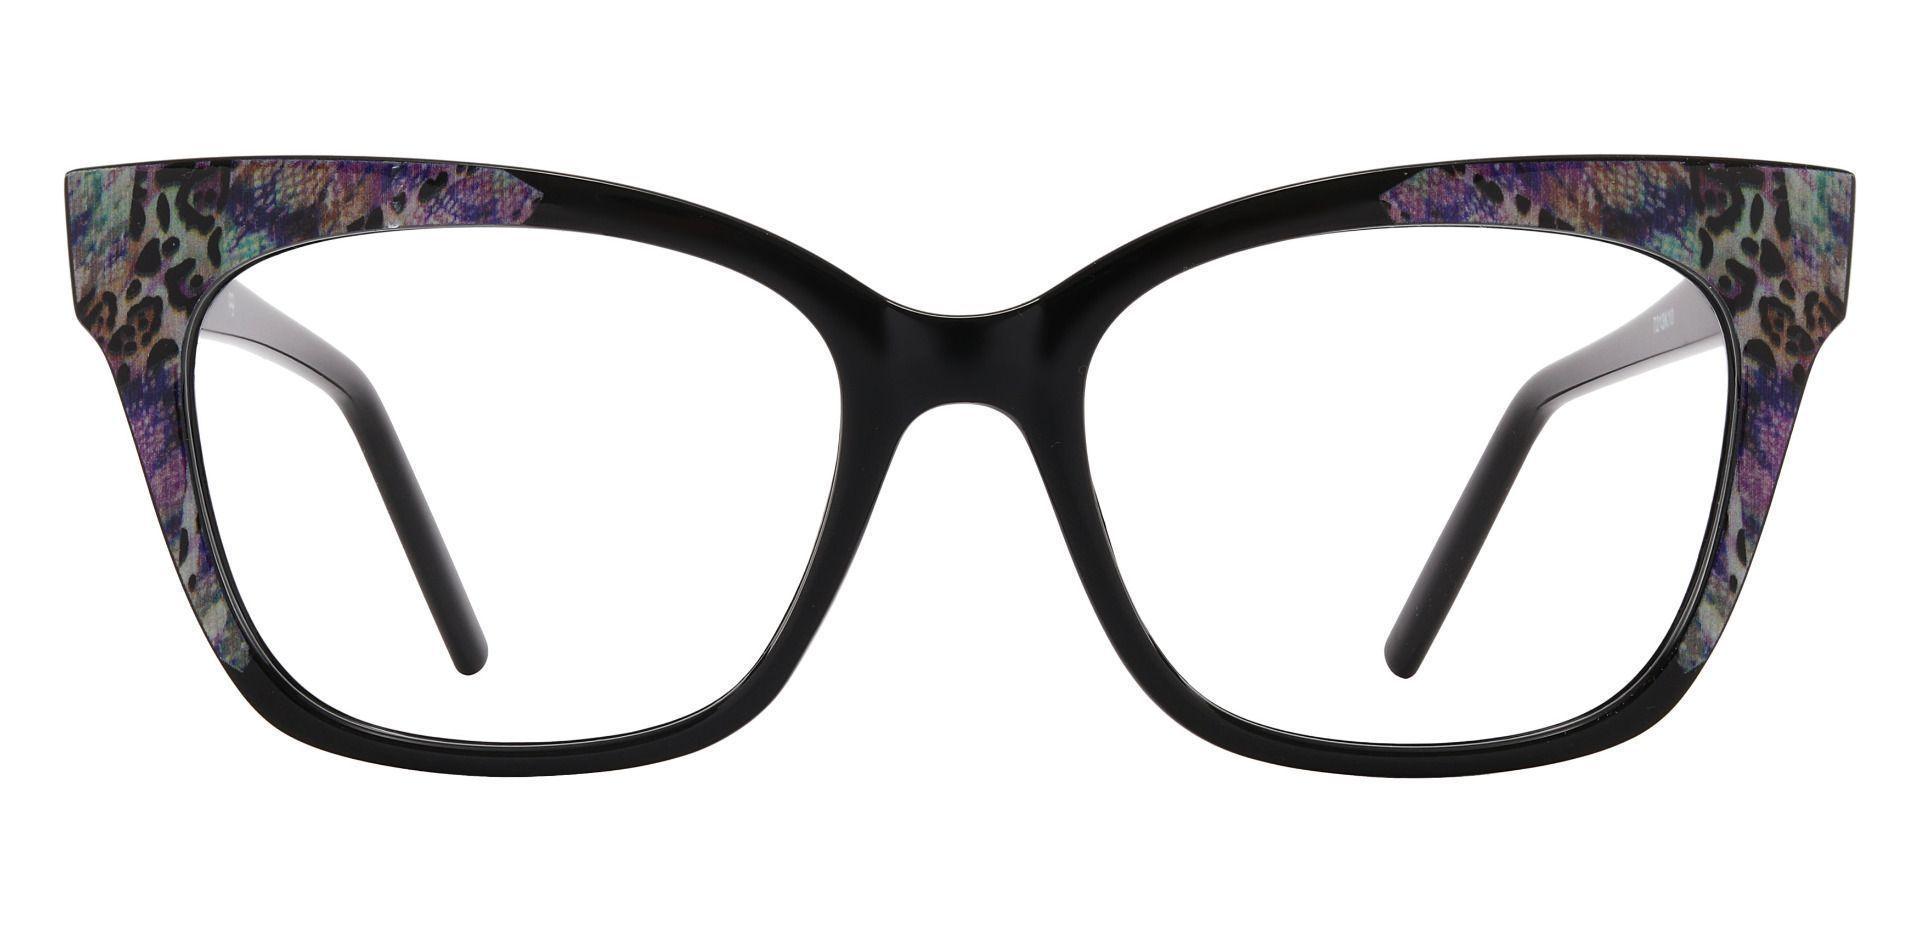 Hera Cat Eye Prescription Glasses - Black